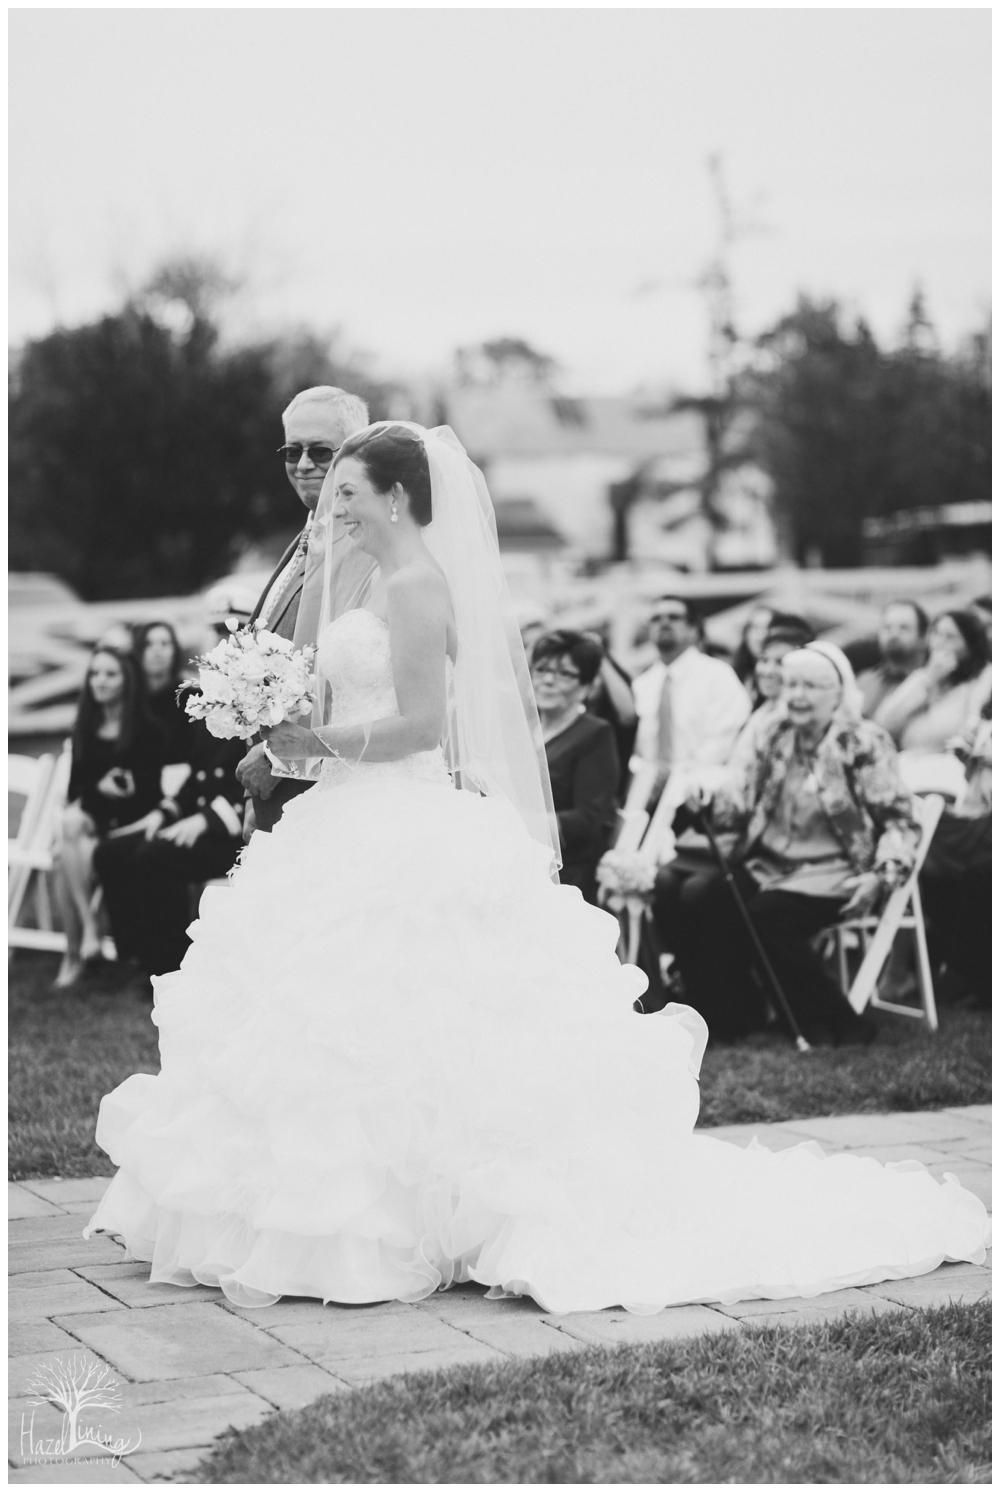 hazel-lining-photography-wedding-portrait-buckscounty-pennsylvania-stephanie-reif_0142.jpg